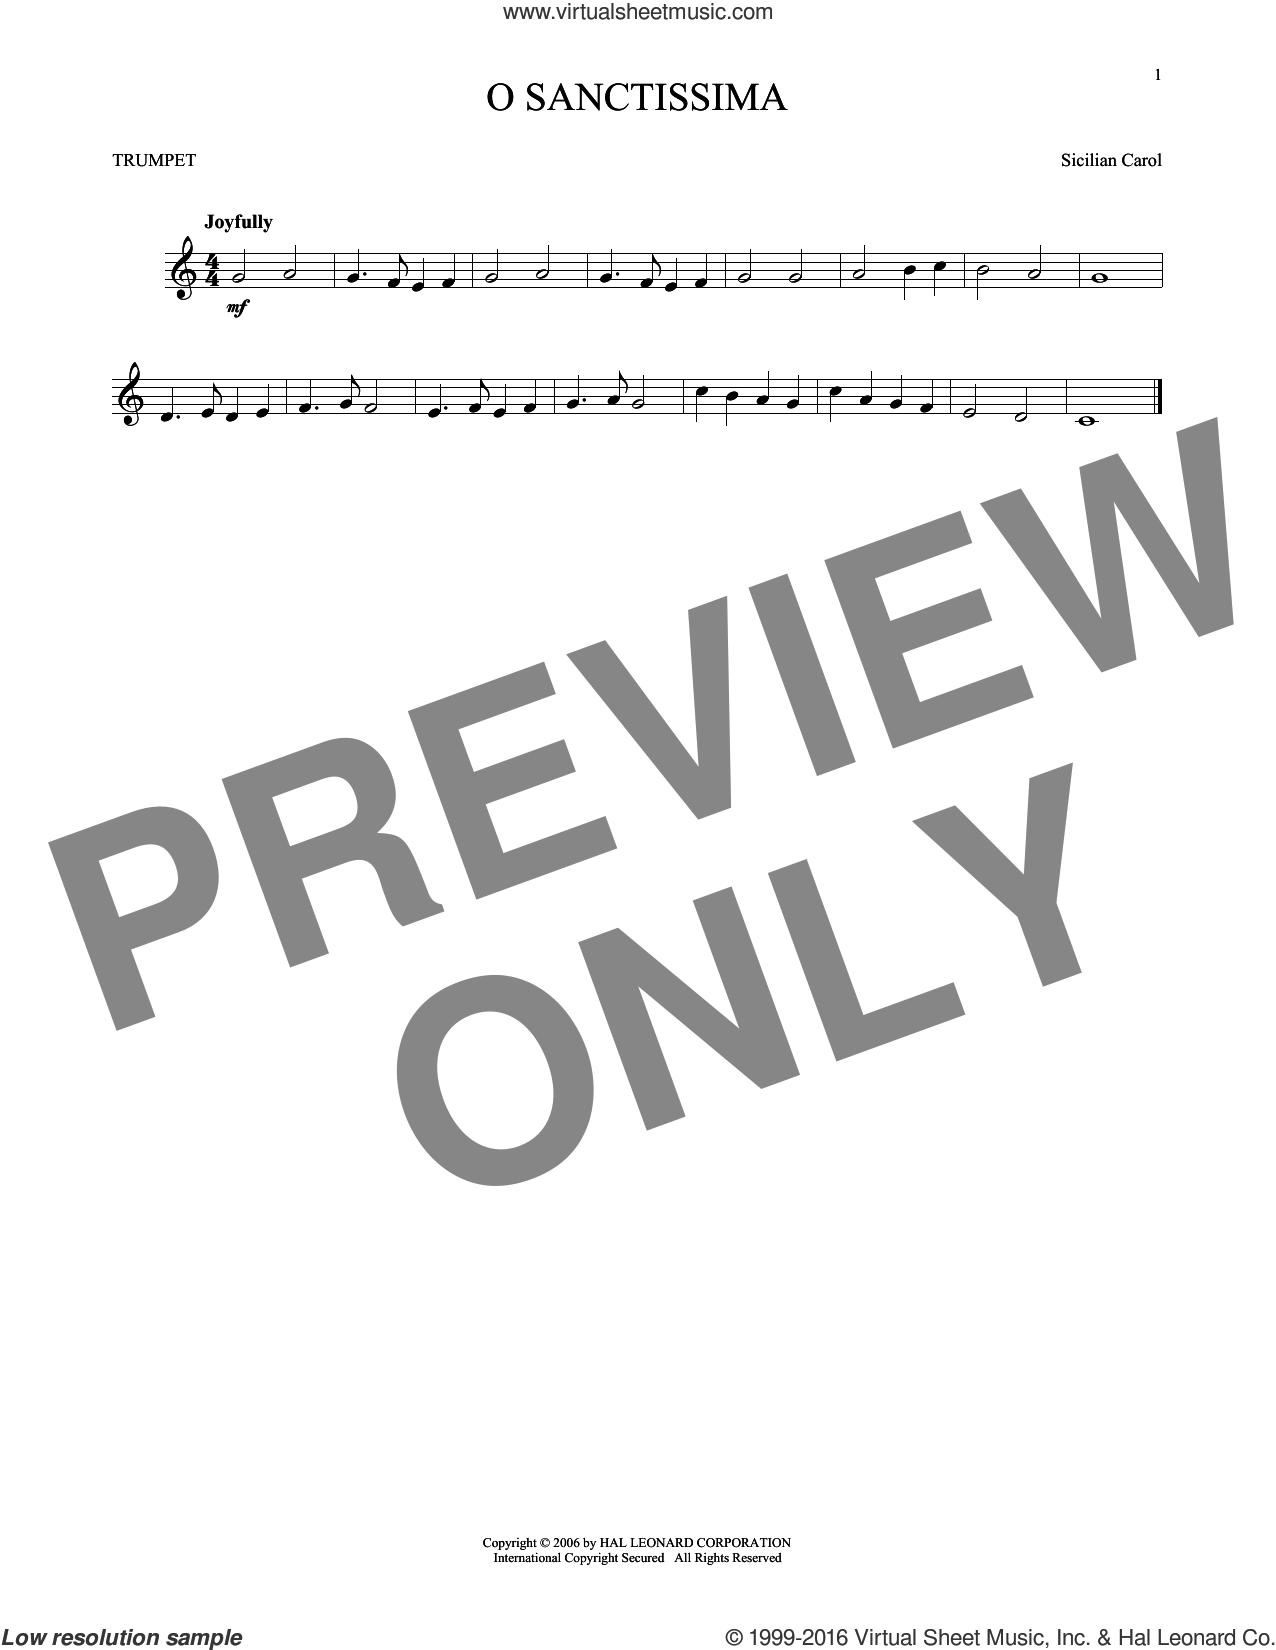 O Sanctissima sheet music for trumpet solo, intermediate skill level